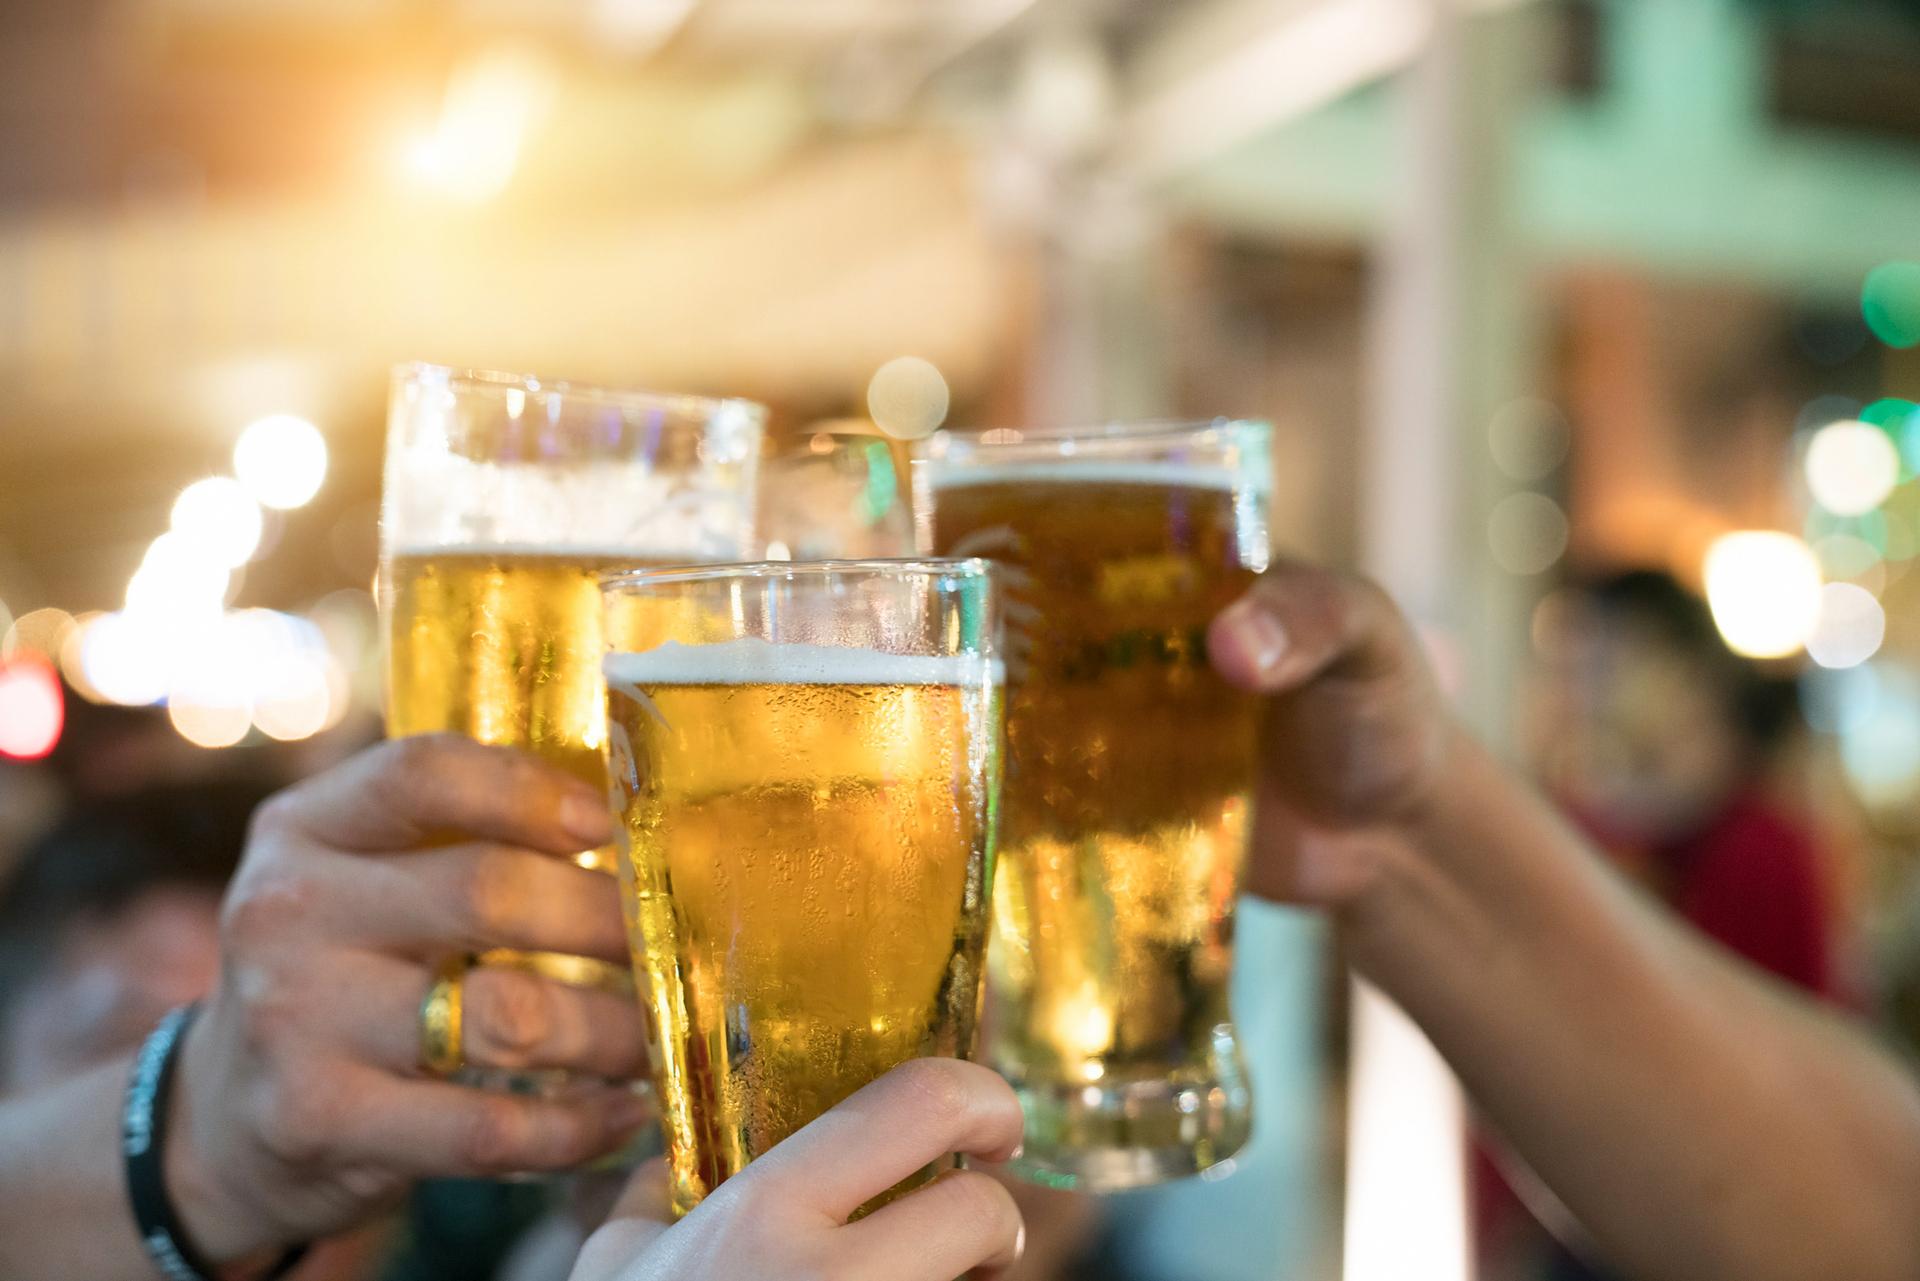 New Zealand's beer industry worth $2.3 billion